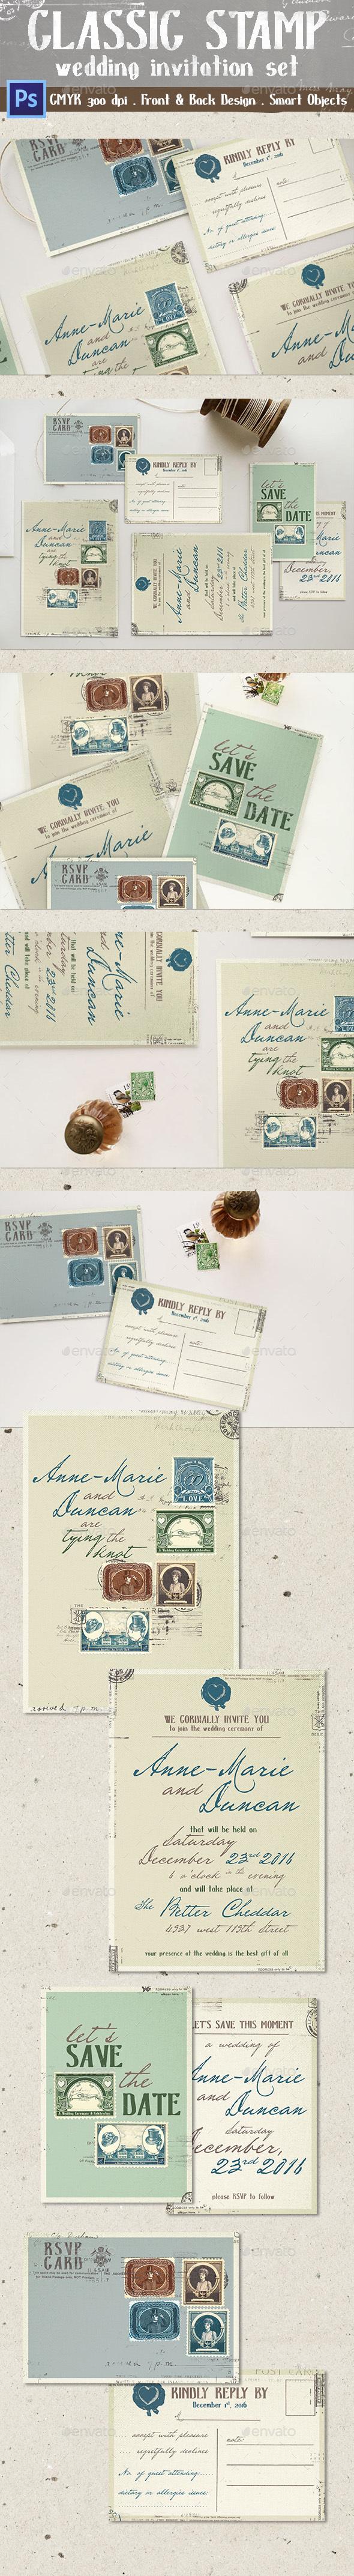 Classic Stamp Wedding Invitation - Weddings Cards & Invites